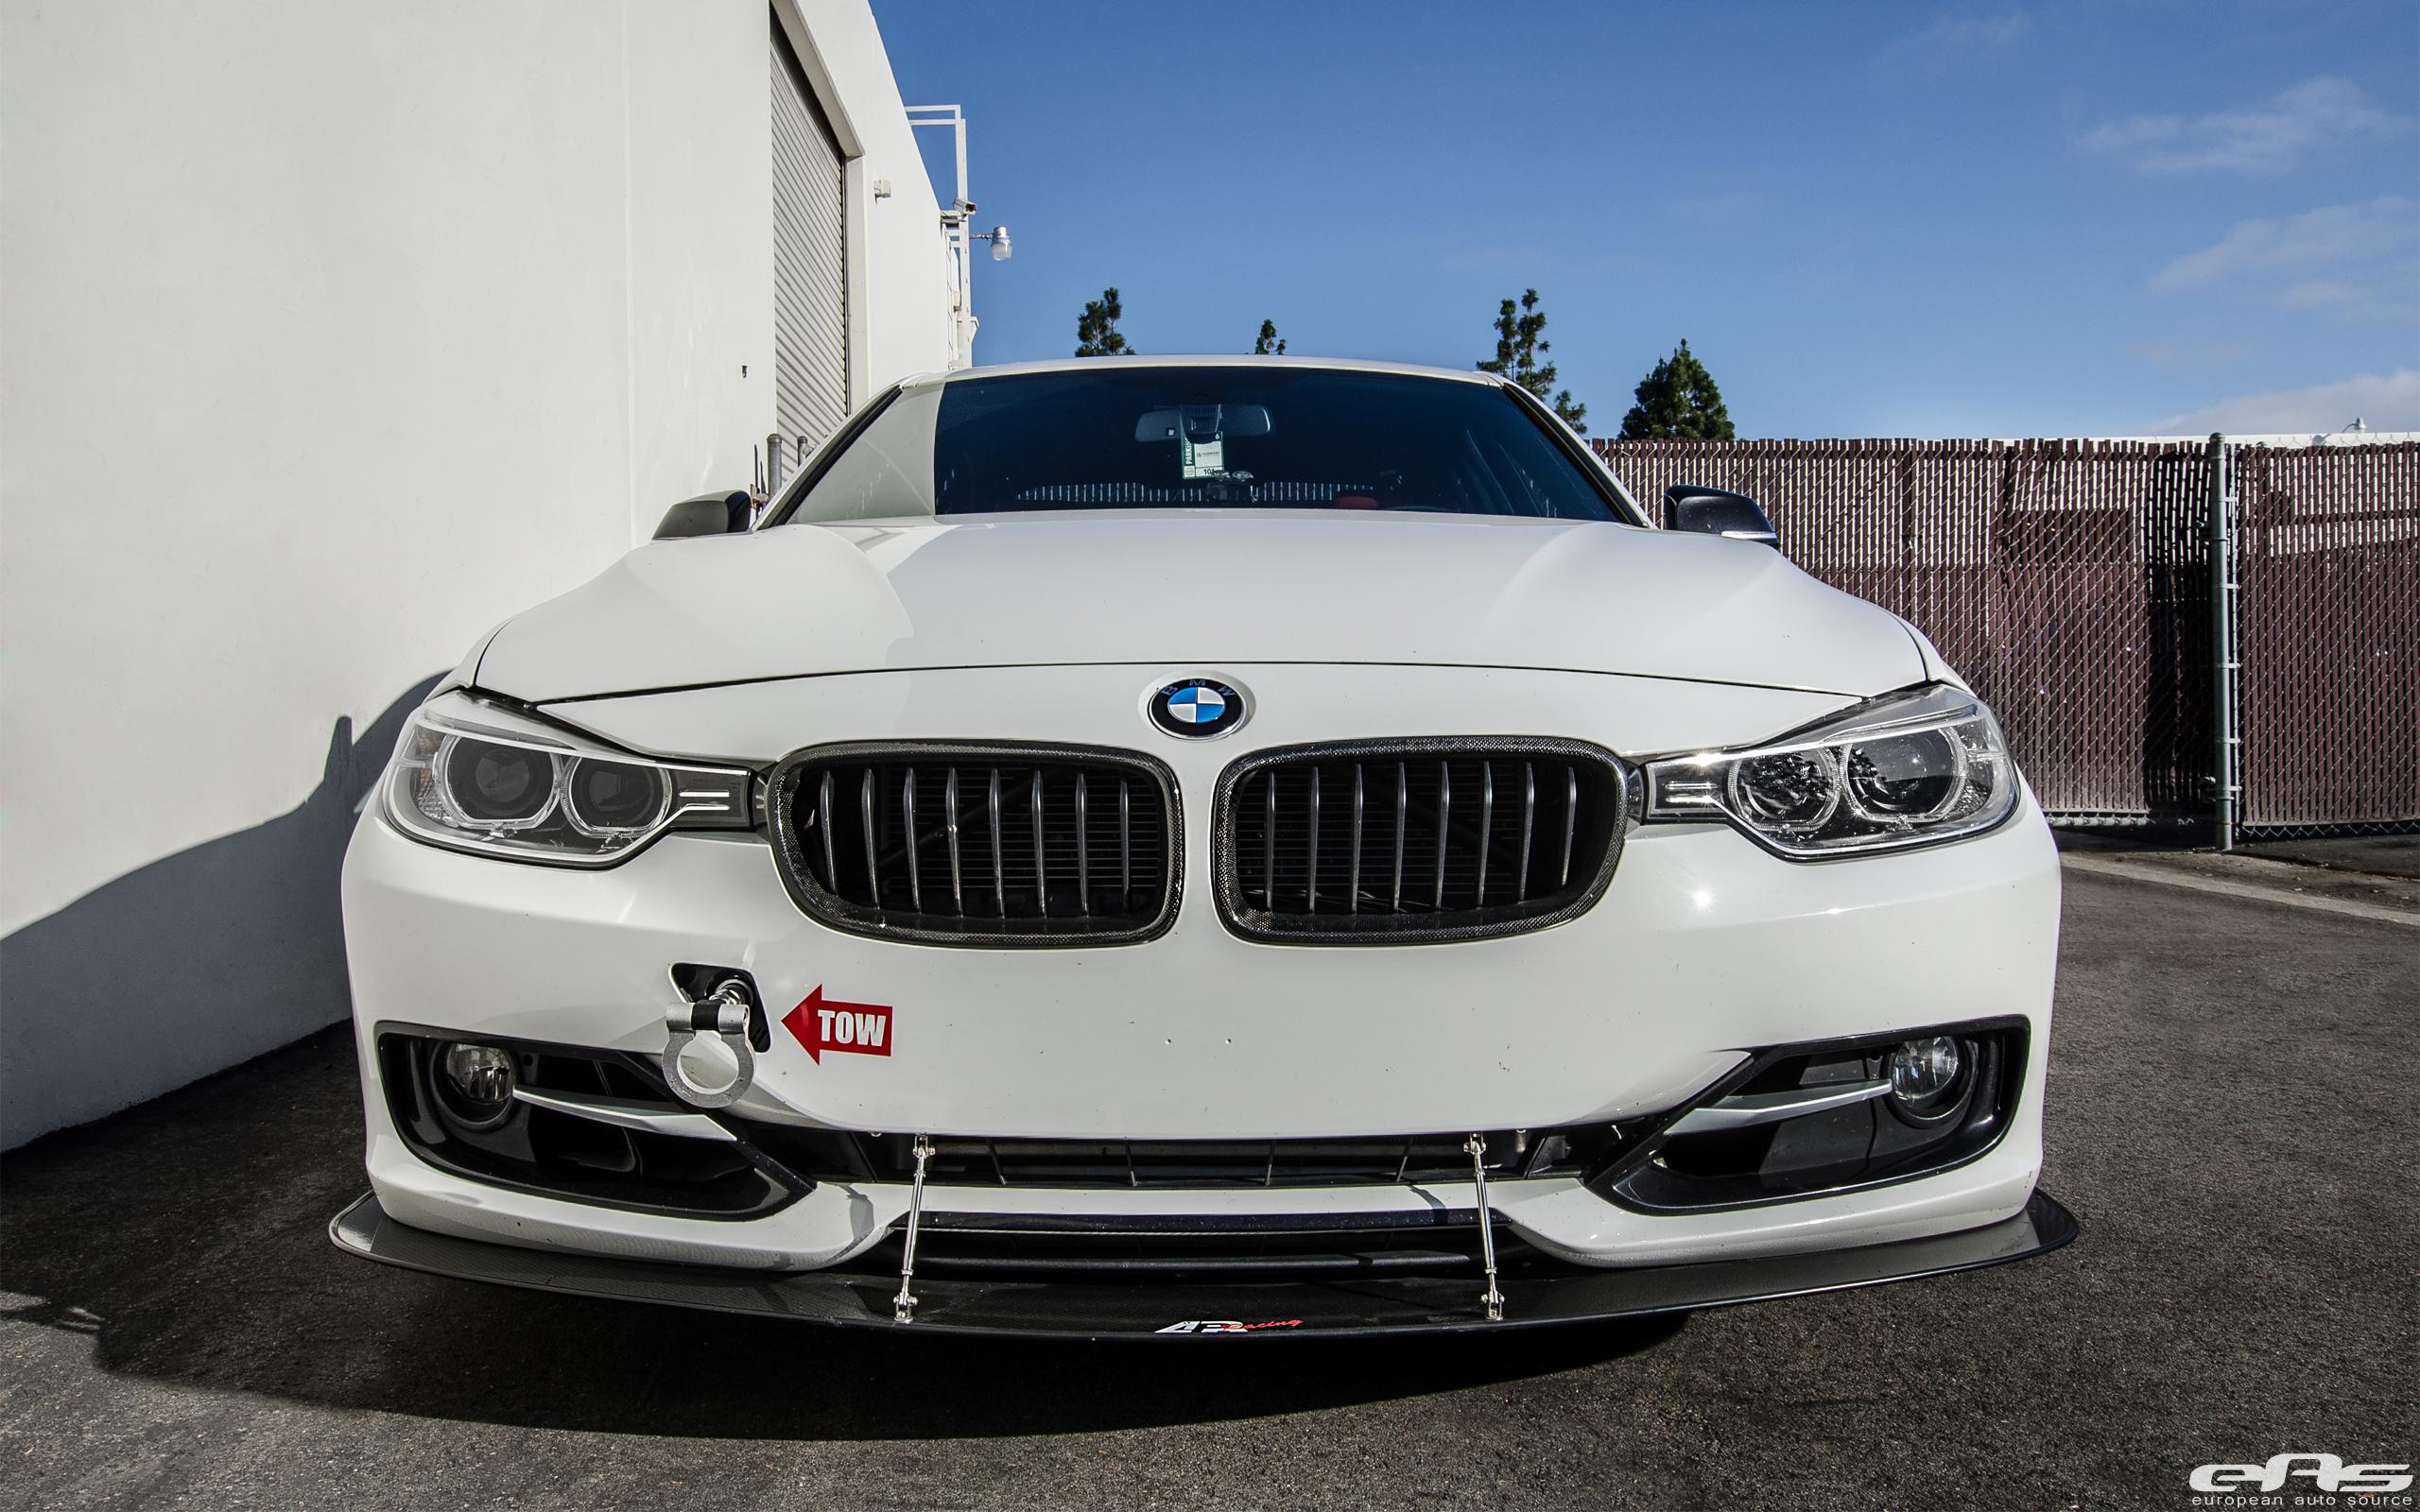 Alpine White BMW F30 Gets An Interesting Aero Package 3